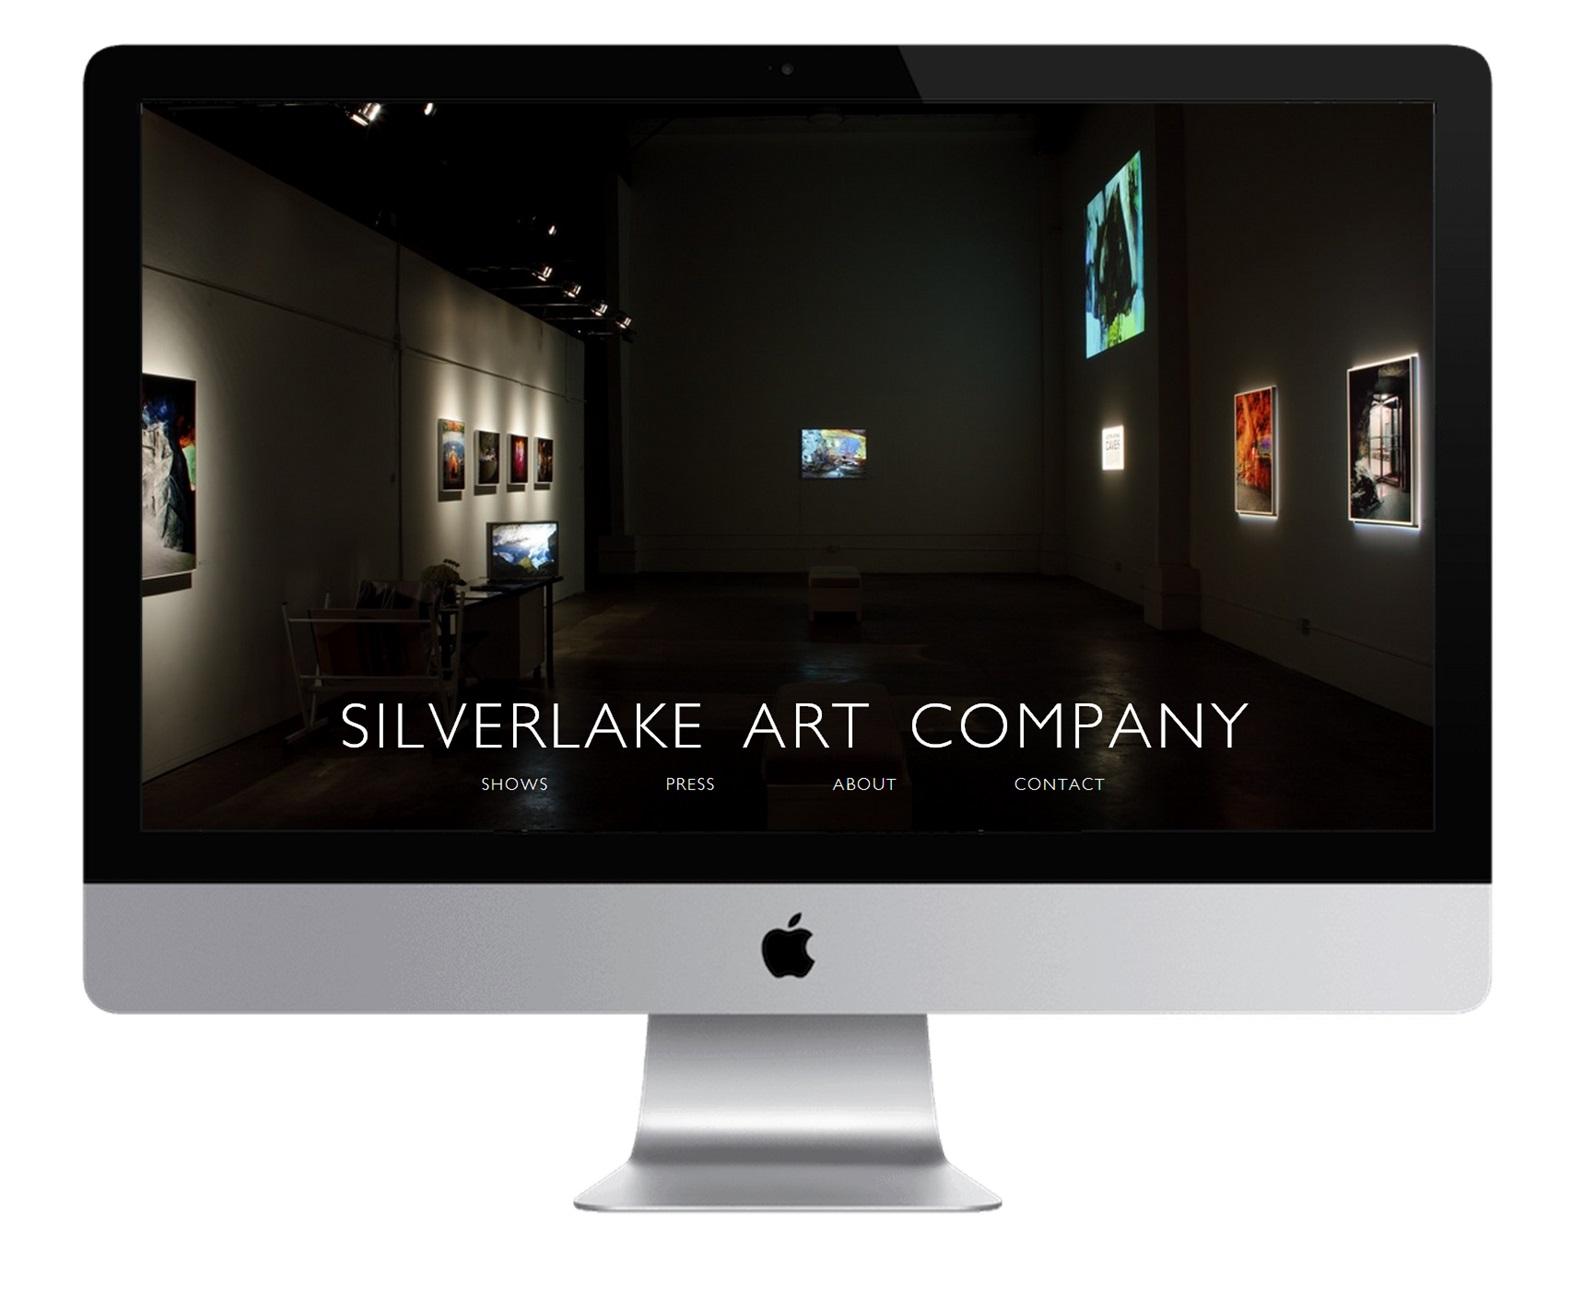 silverlake-art-company